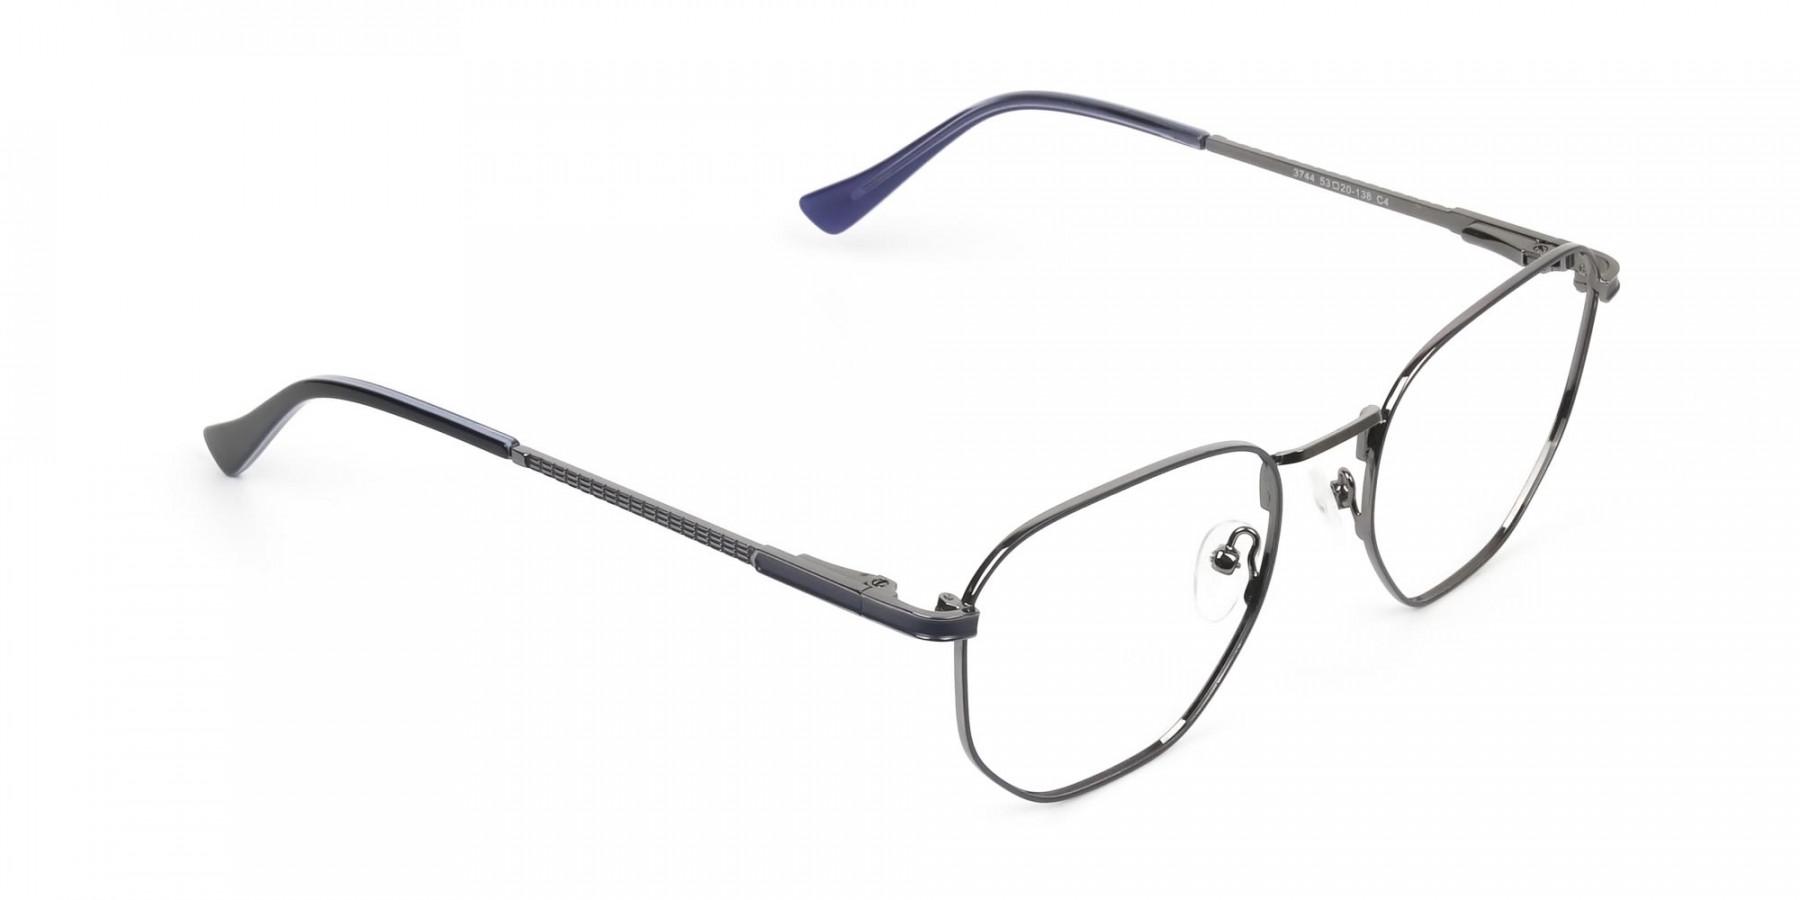 Lightweight Silver & Blue Geometric Glasses - 1